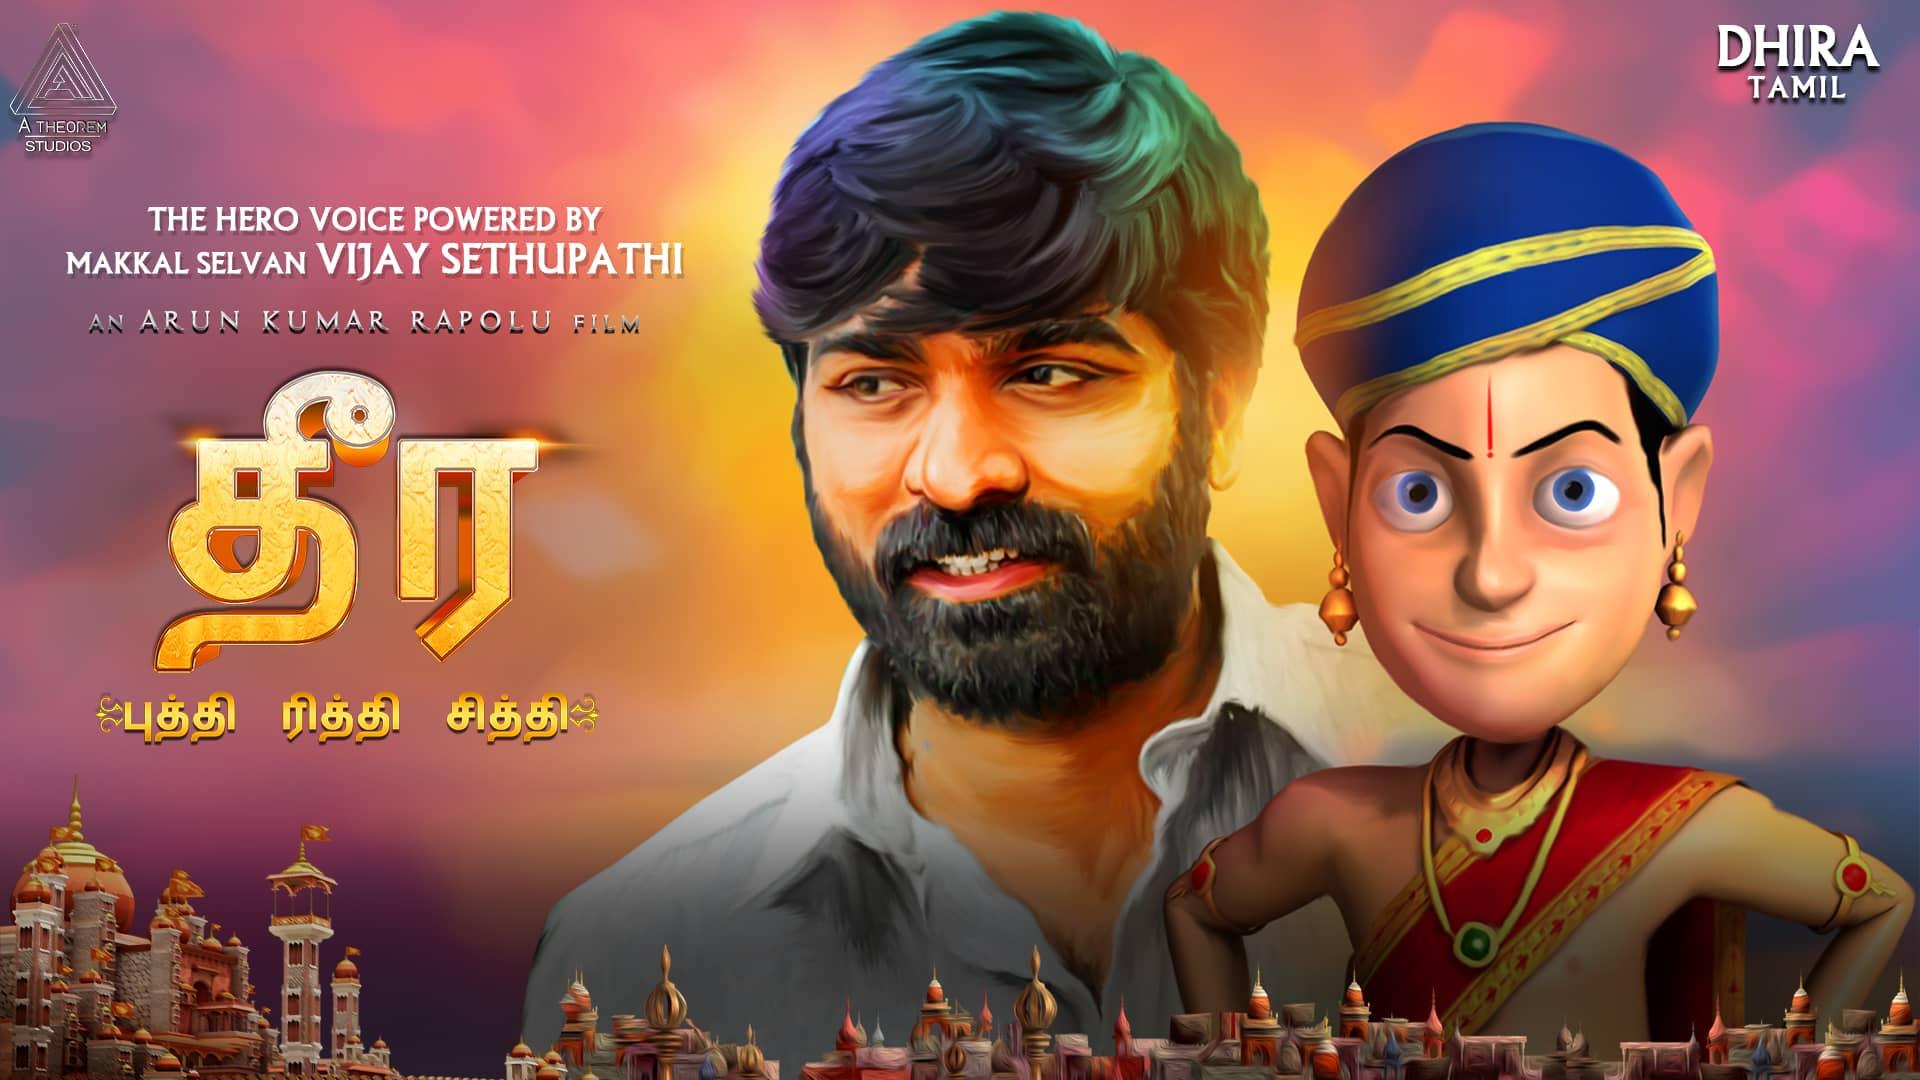 Dhira (Tamil) Poster